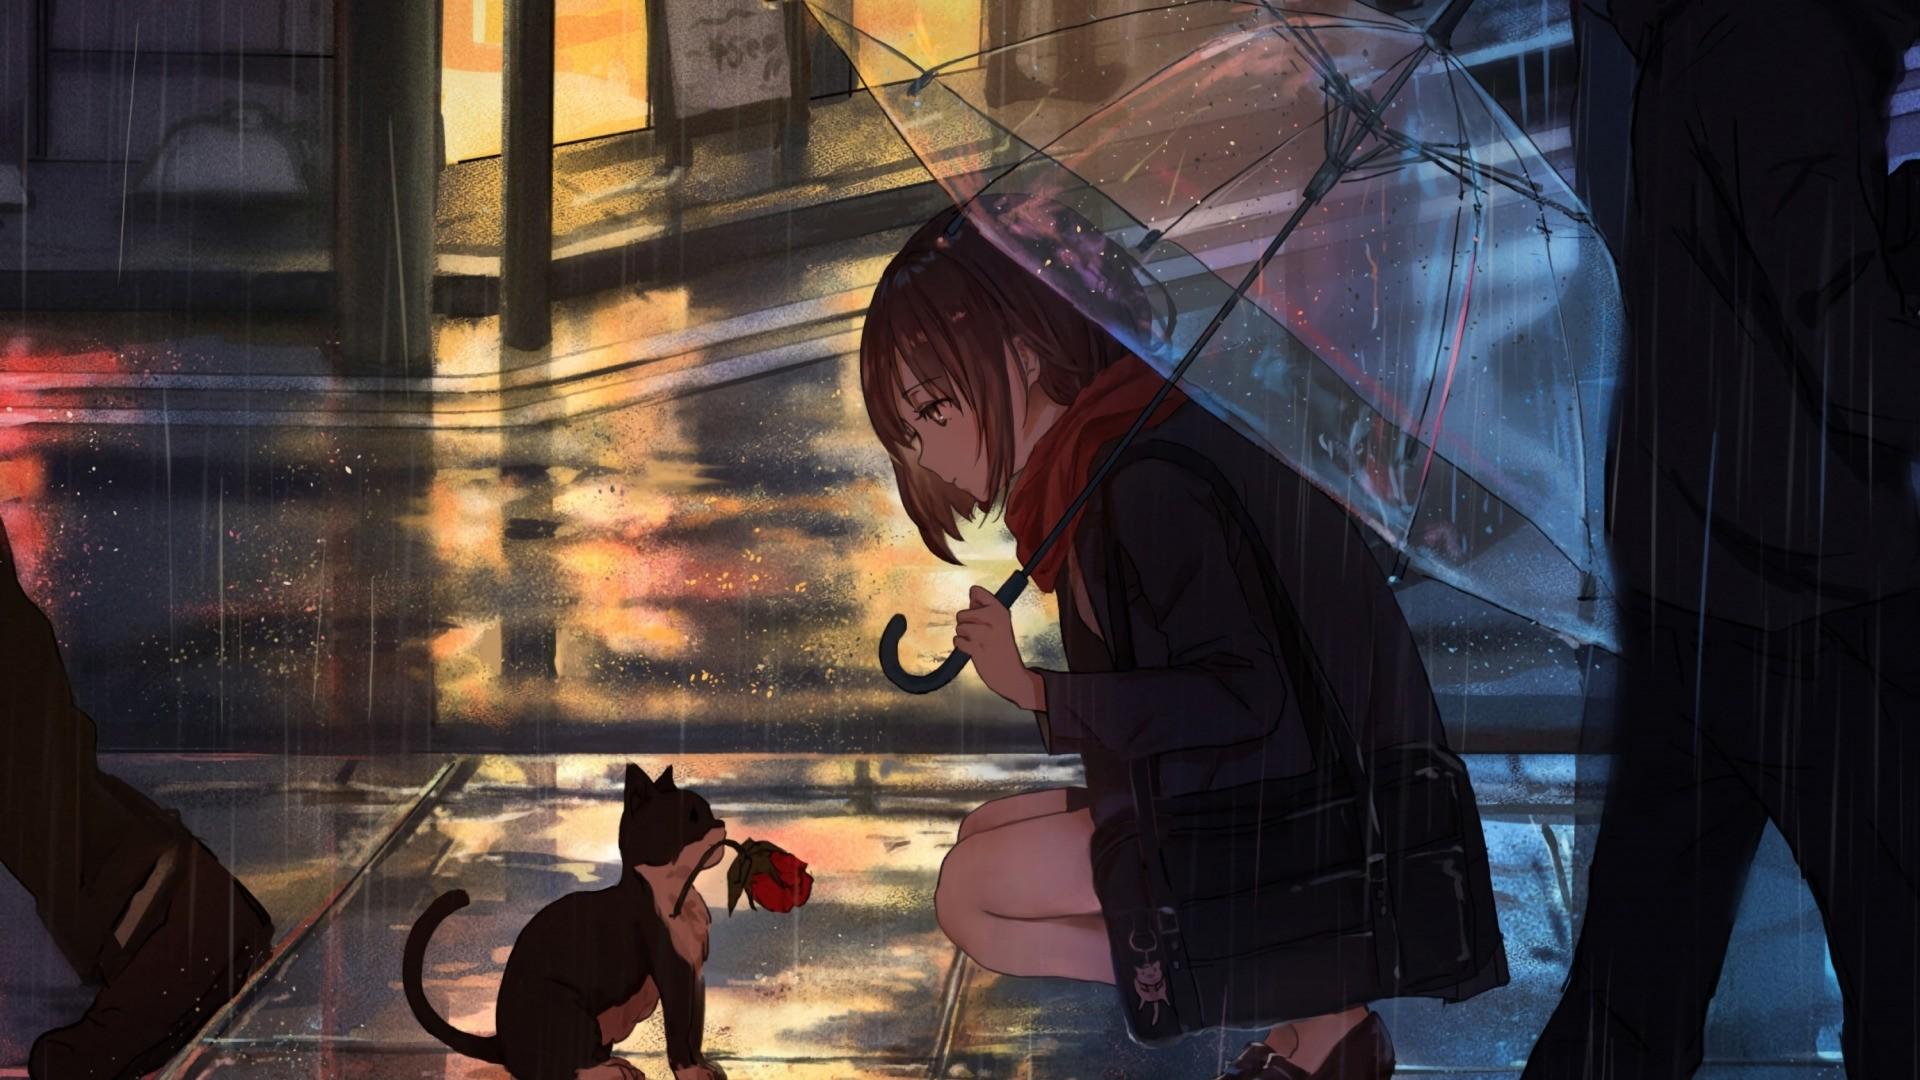 Anime Rain Background Wallpaper